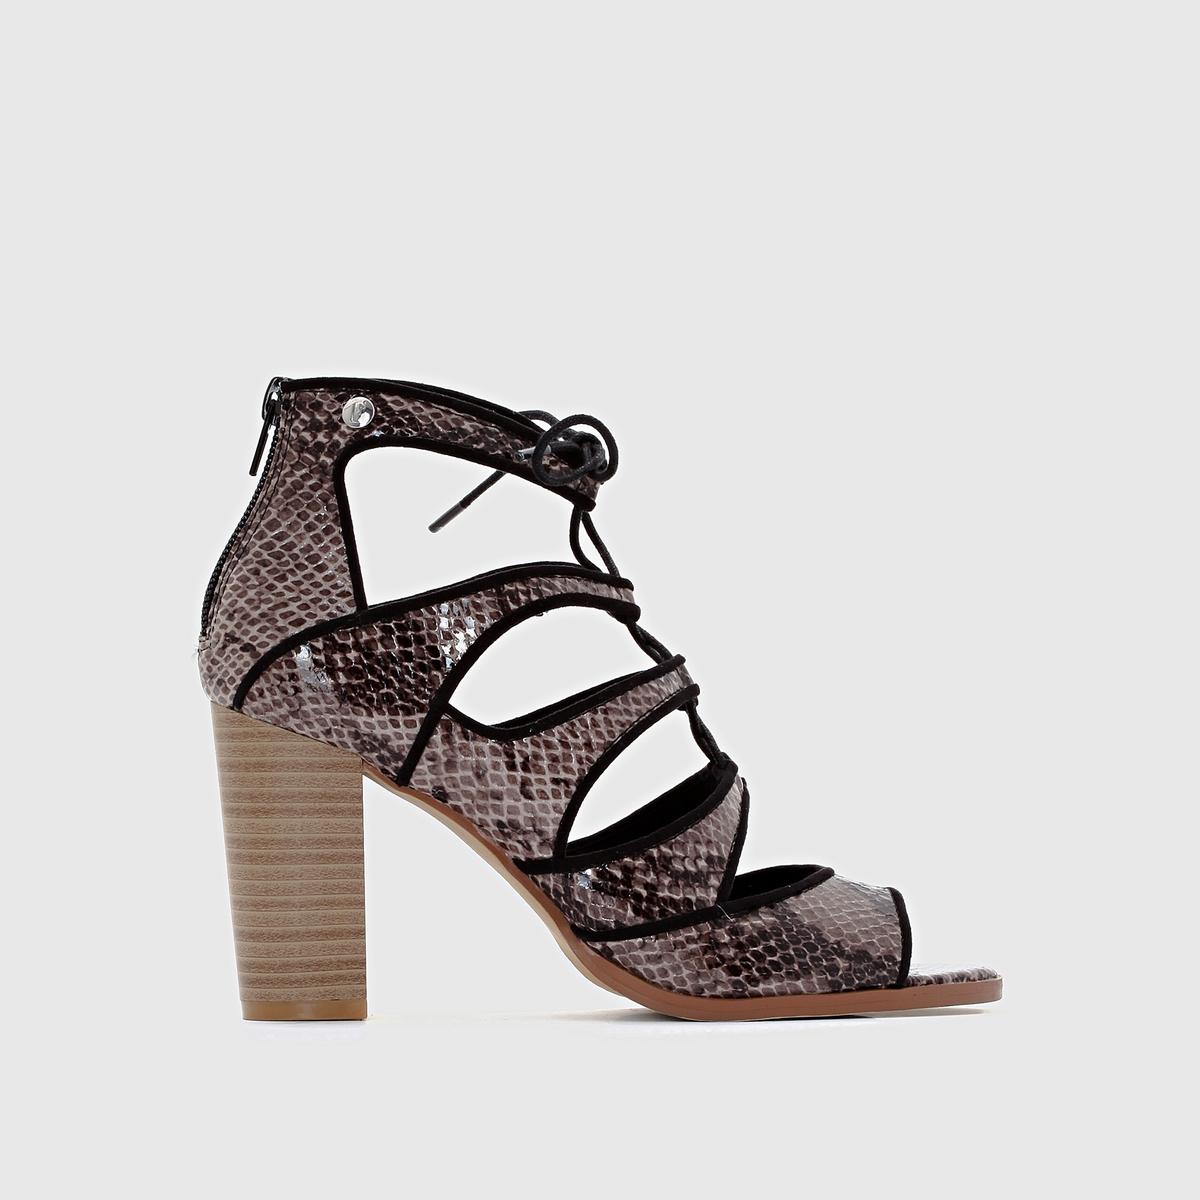 Босоножки на высоком каблуке ELLE elle trend2015 mochila